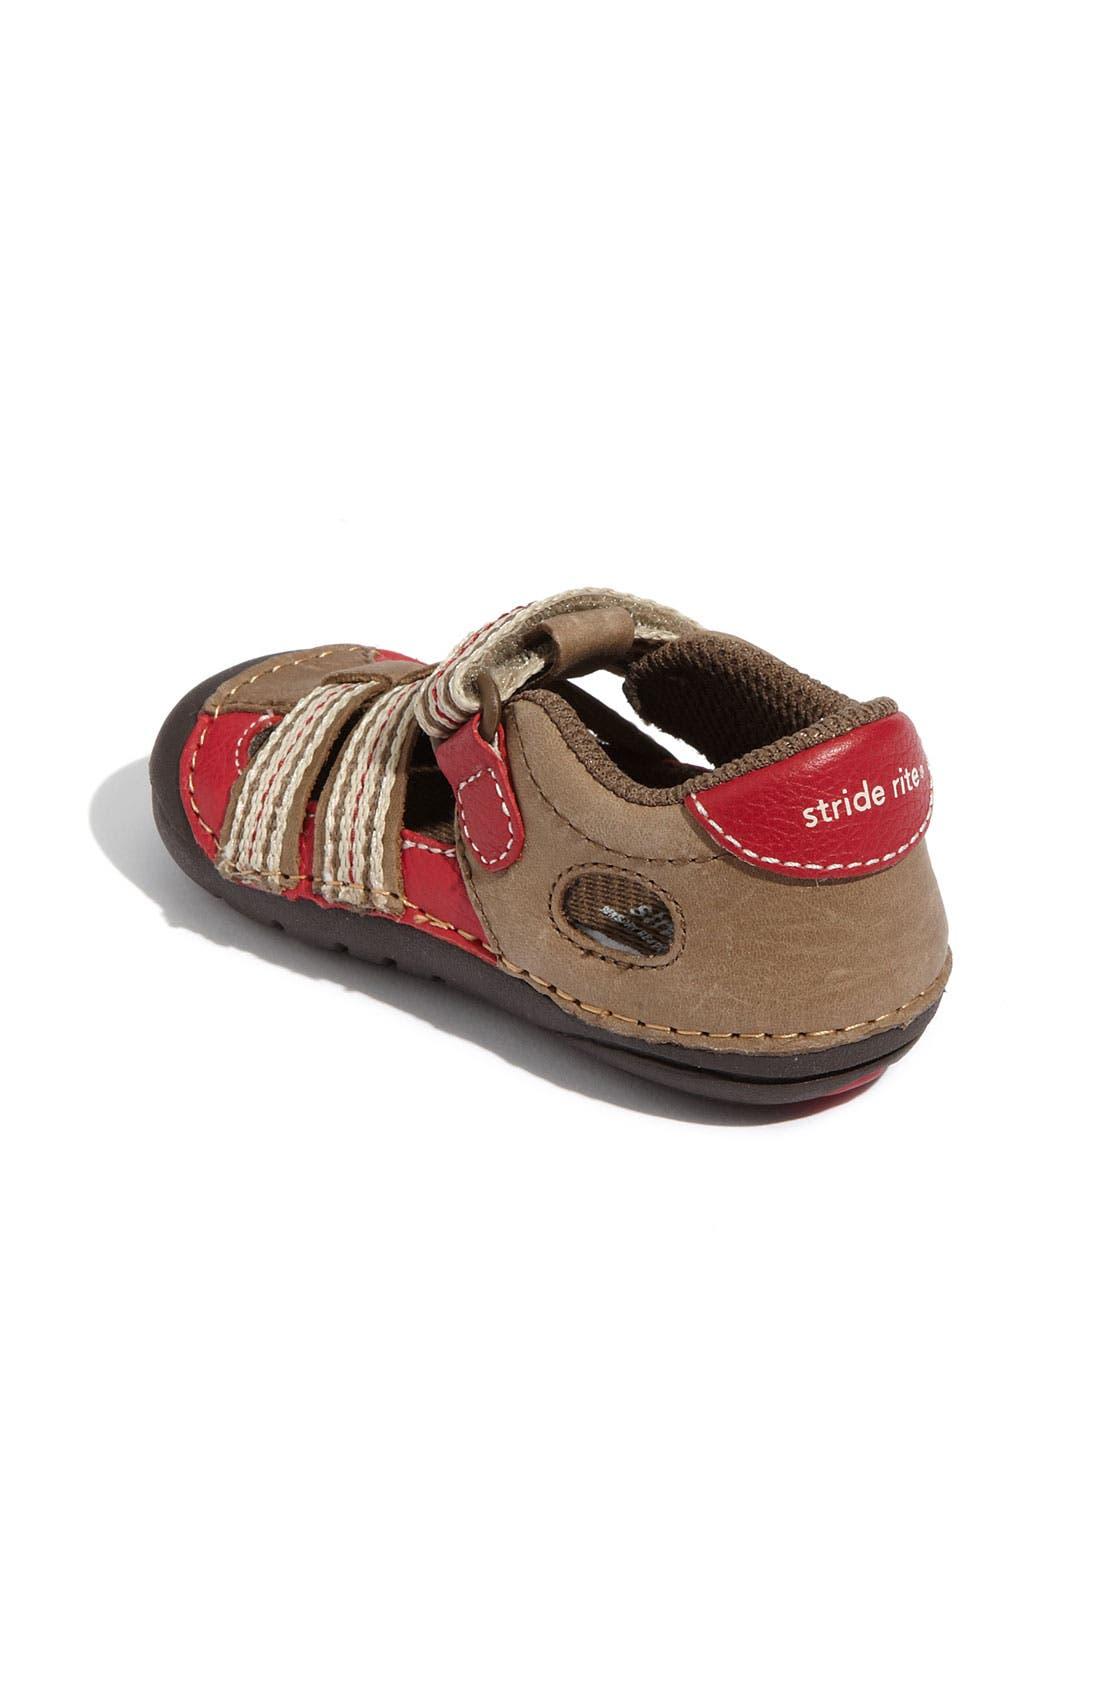 Alternate Image 2  - Stride Rite 'Calf' Sandal (Baby & Walker)